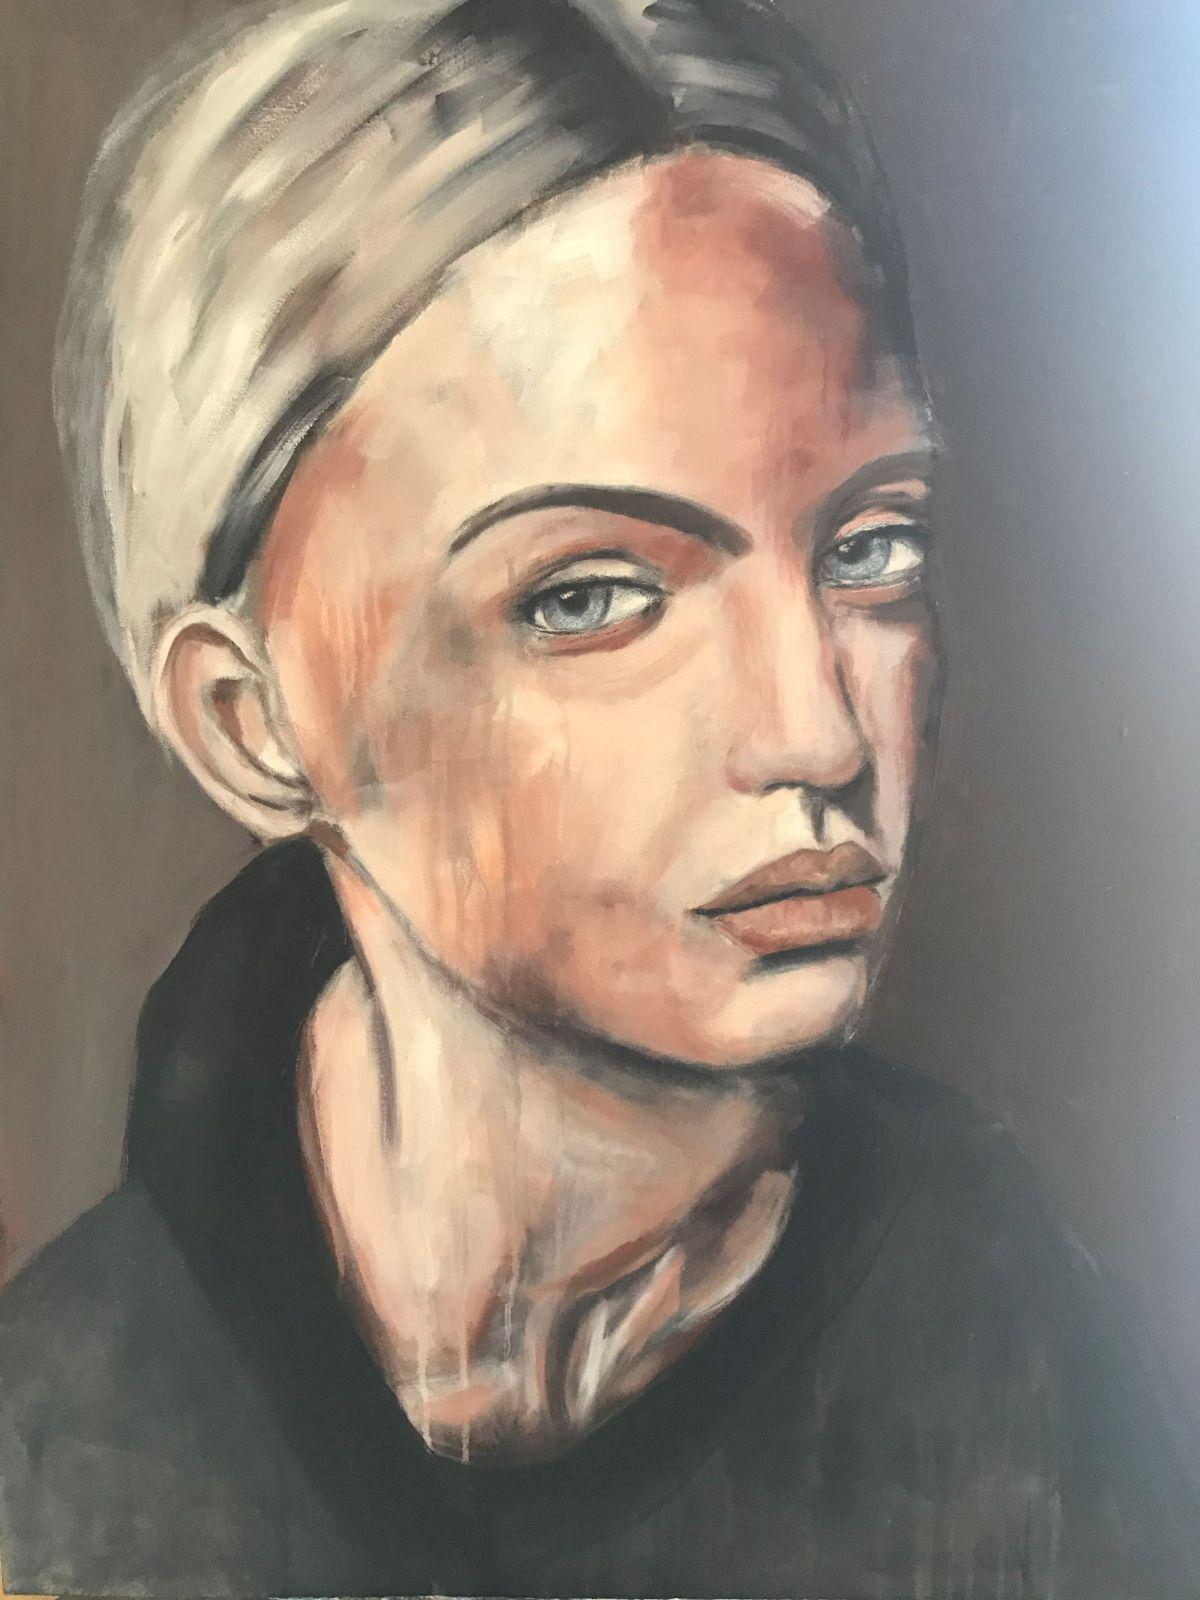 Porträt, 'Joerdis', Öl auf Leinwand, 100 cm h x 80 cm b x 3 cm t